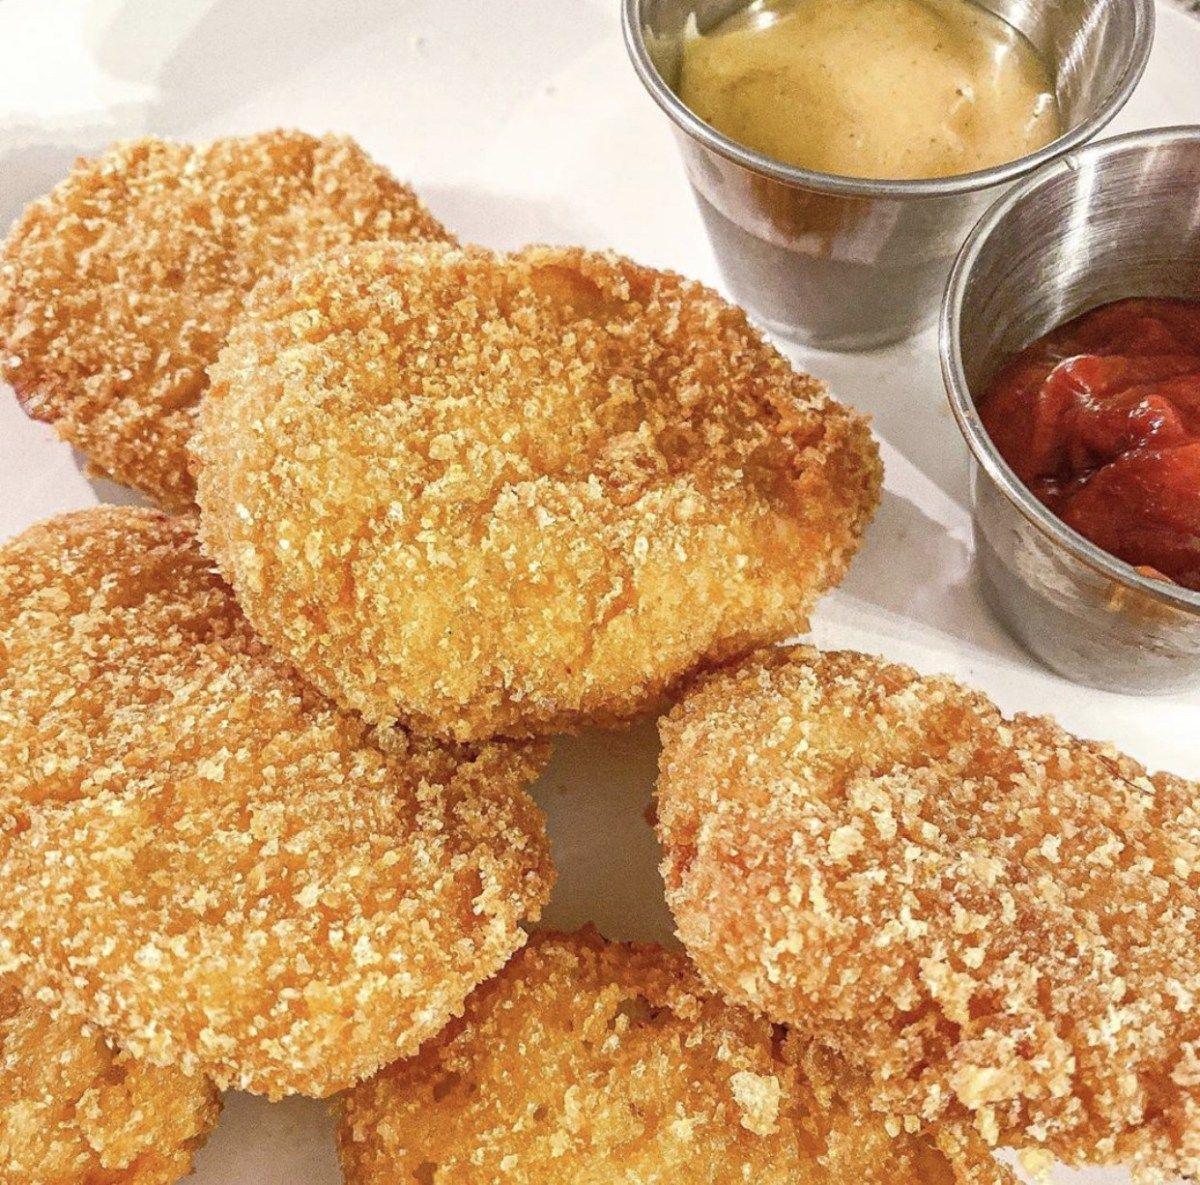 KETO CHICKEN NUGGETS in 2020 Low carb chicken, Keto